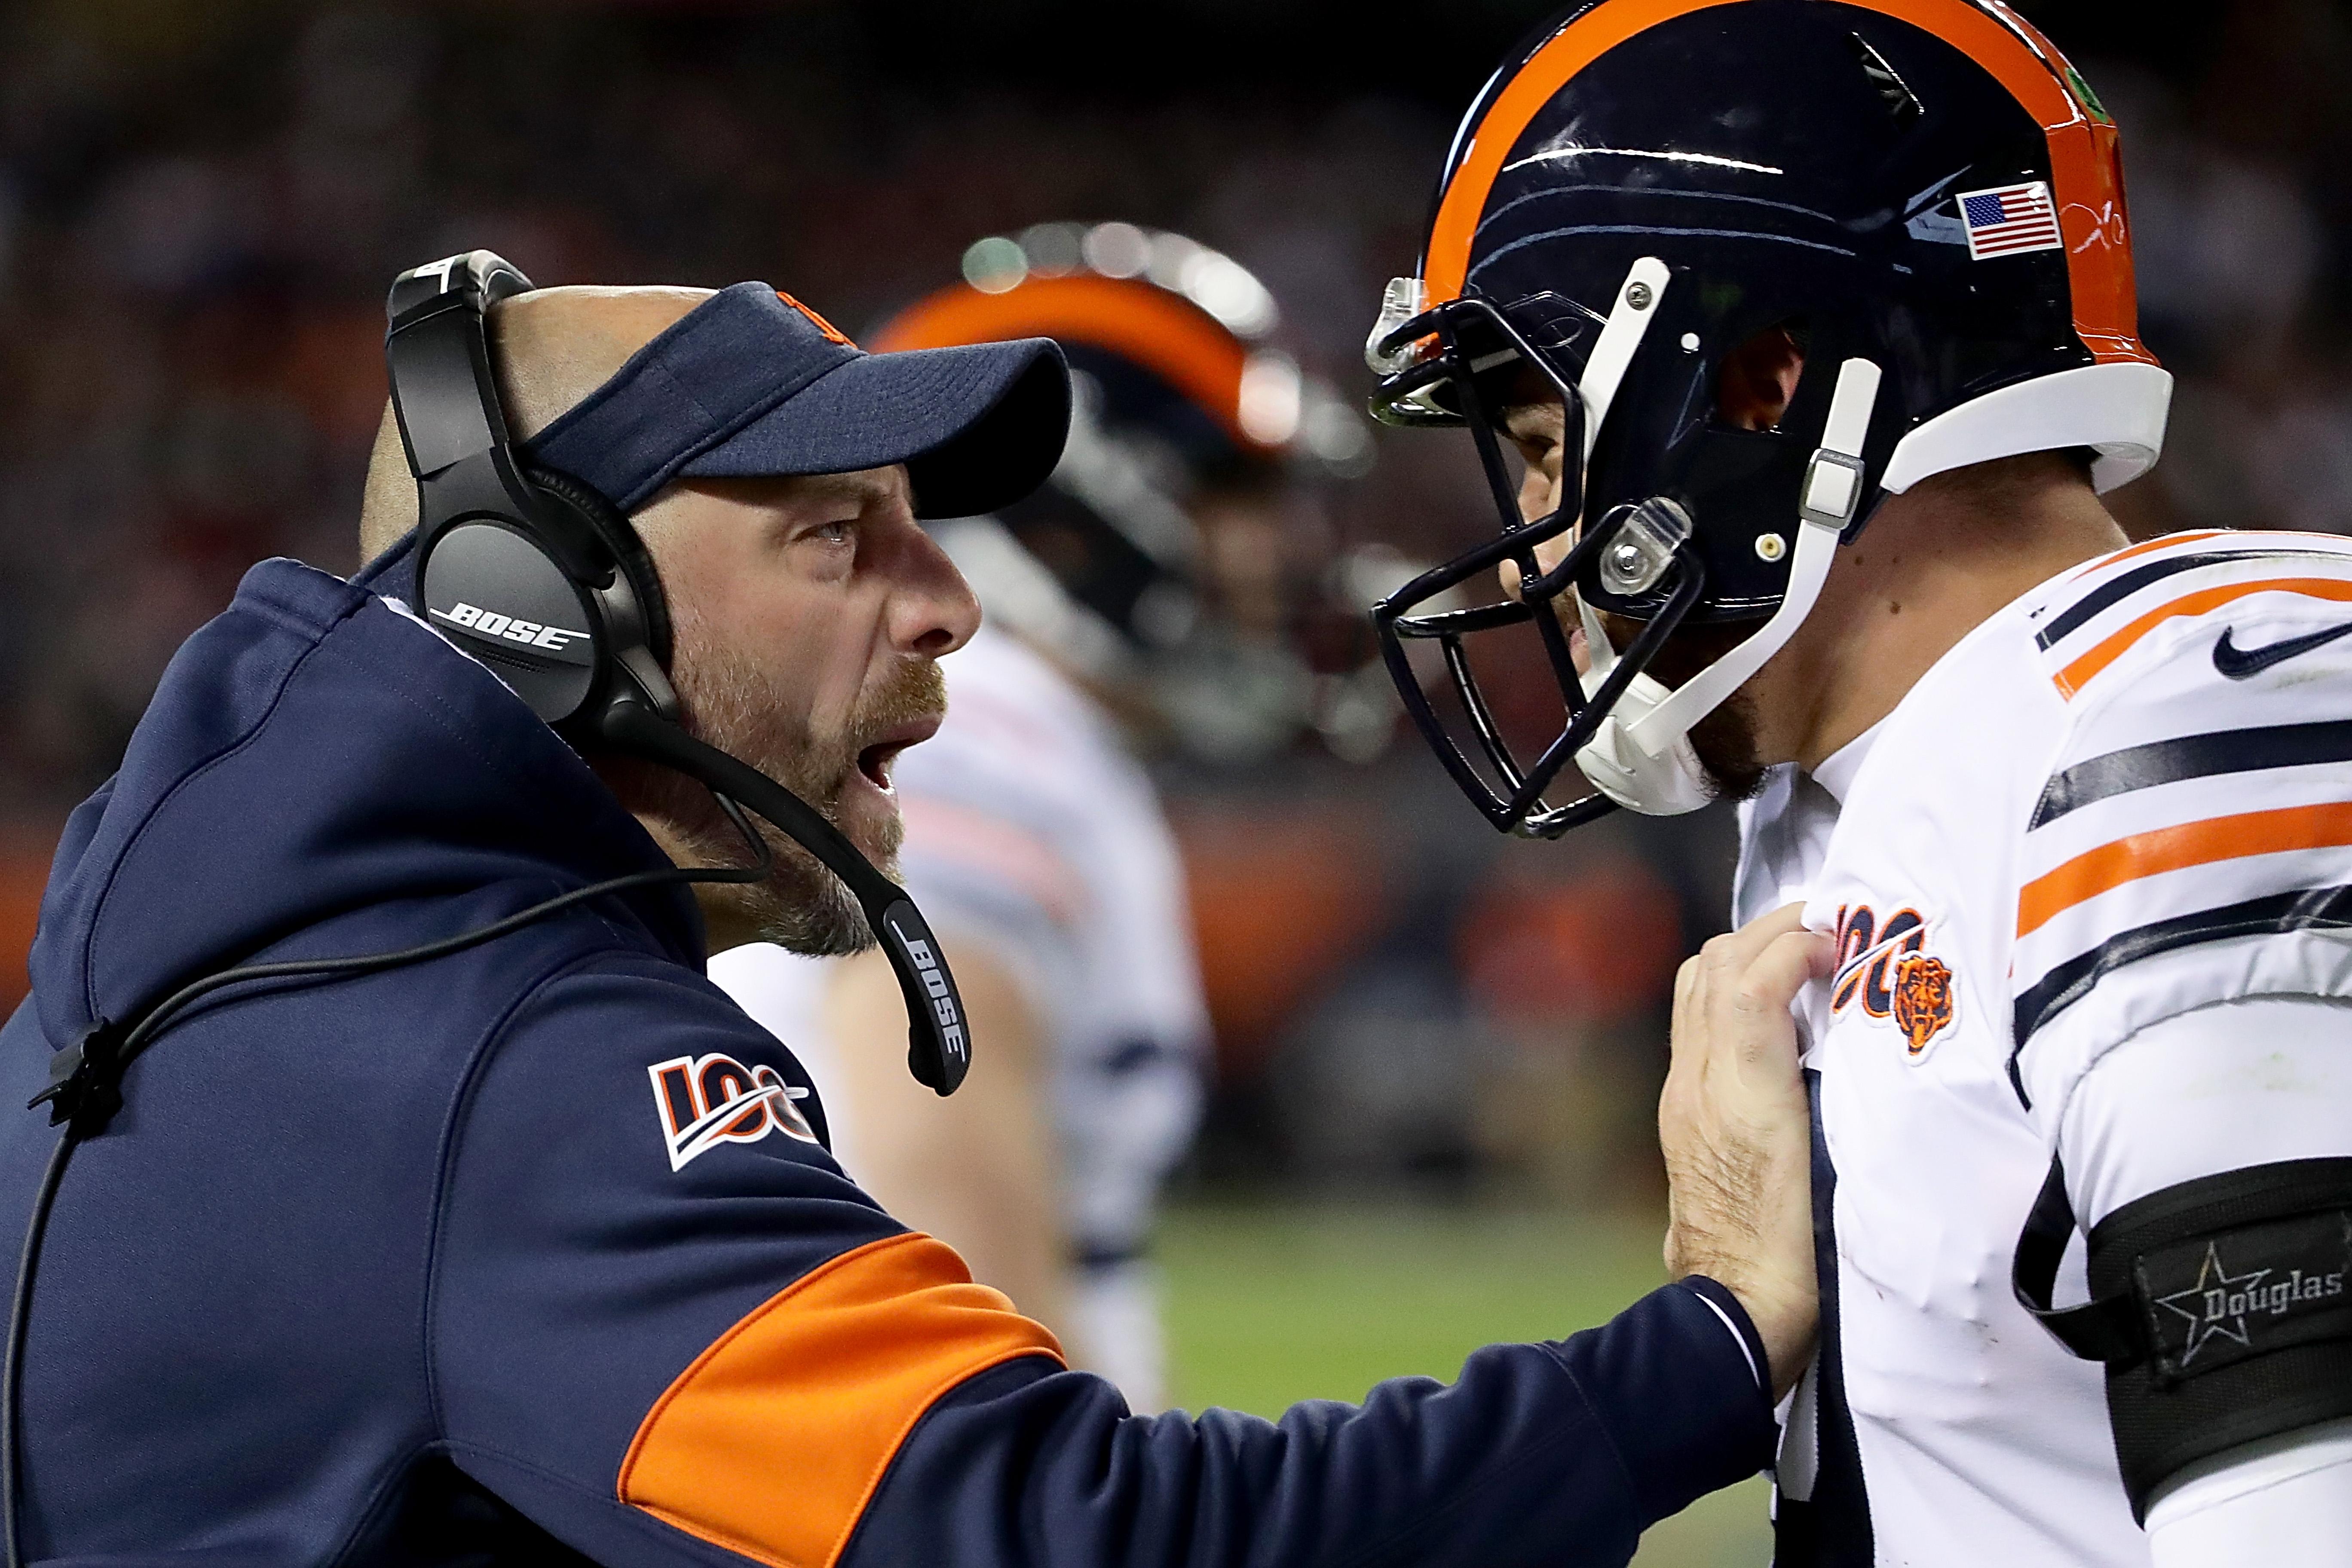 Both Bears coach Matt Nagy (left) and quarterback Mitch Trubisky need big games in the last three weeks of the season.